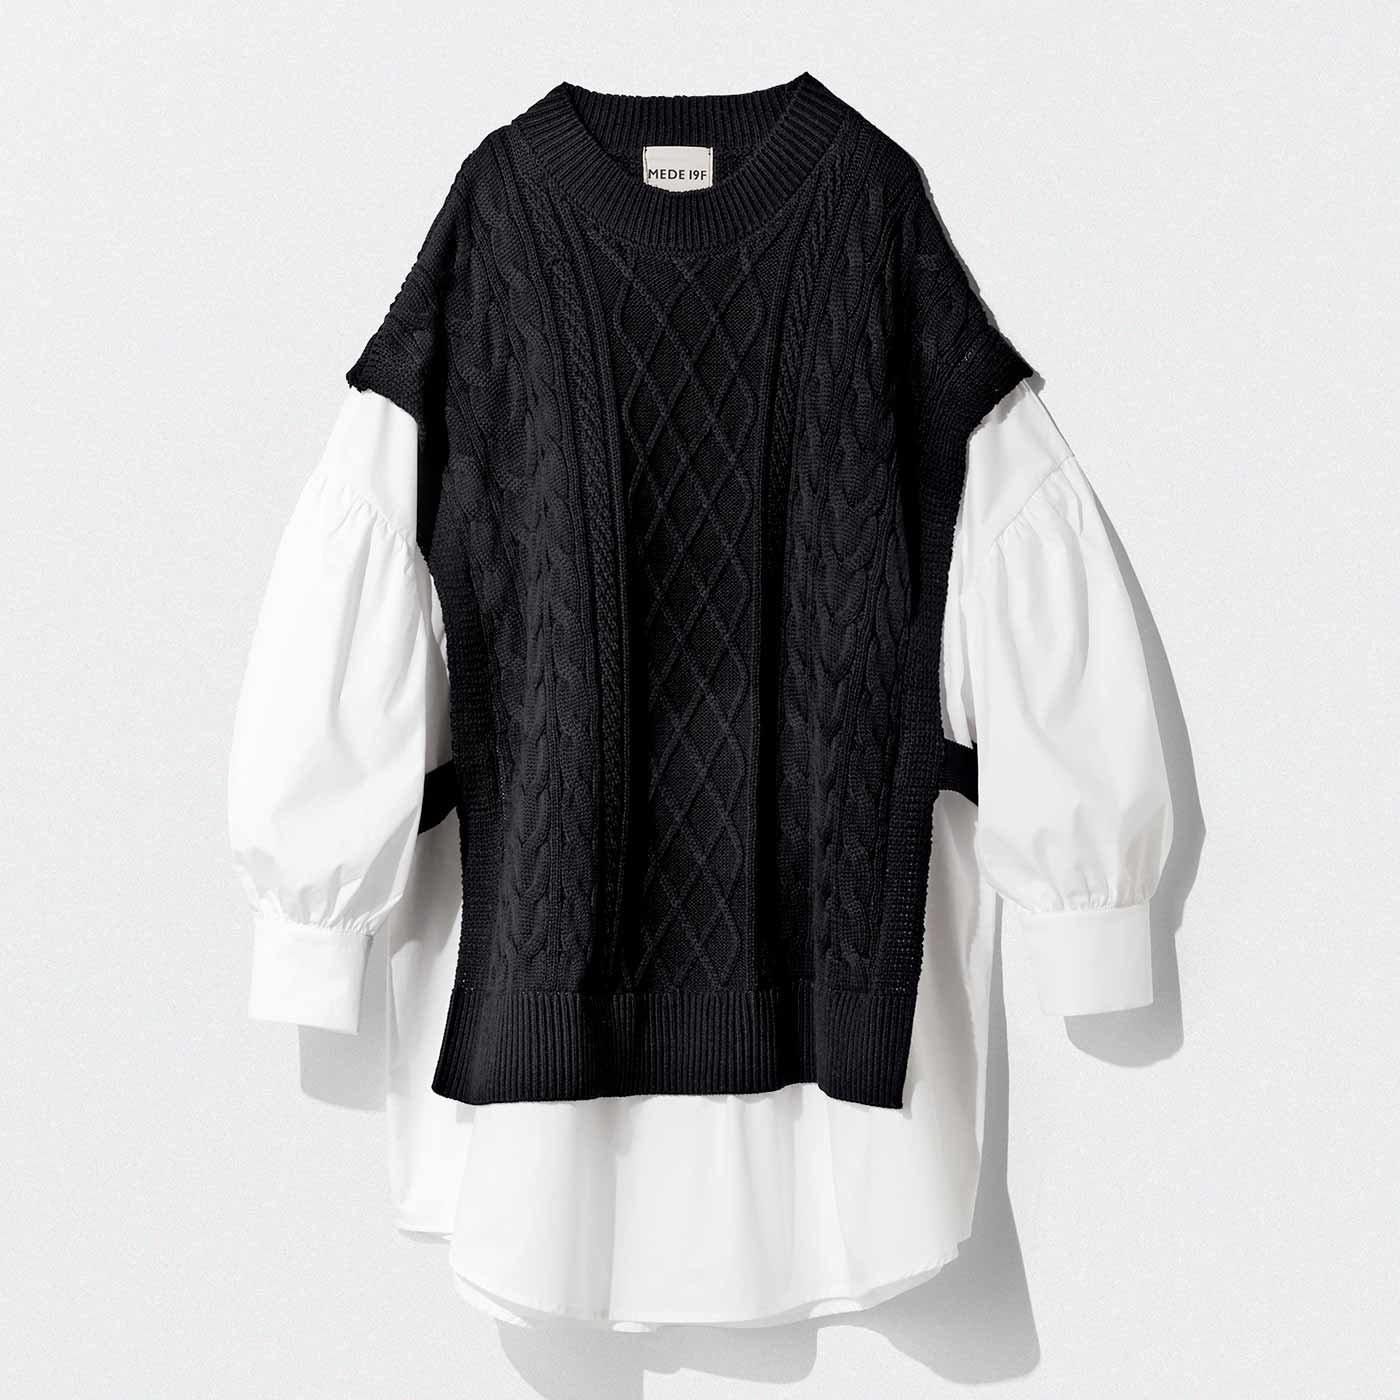 MEDE19F アラン編みニットベストのドッキングシャツトップス〈ブラック〉